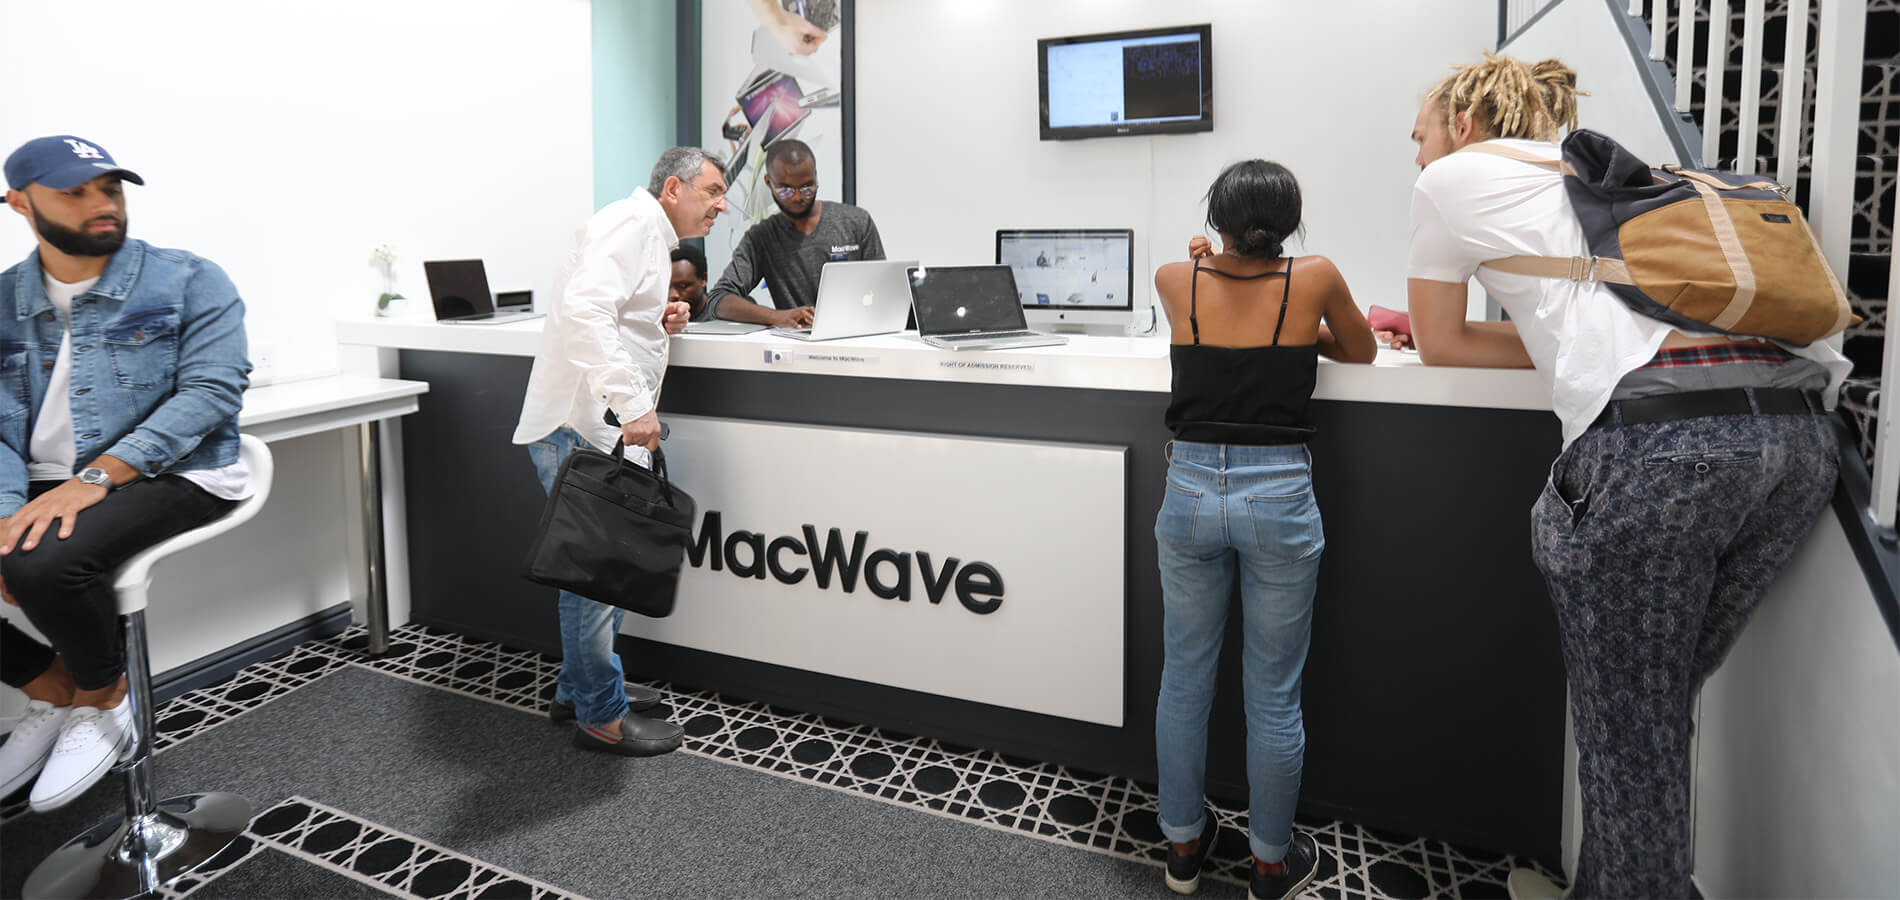 macwave_staff8